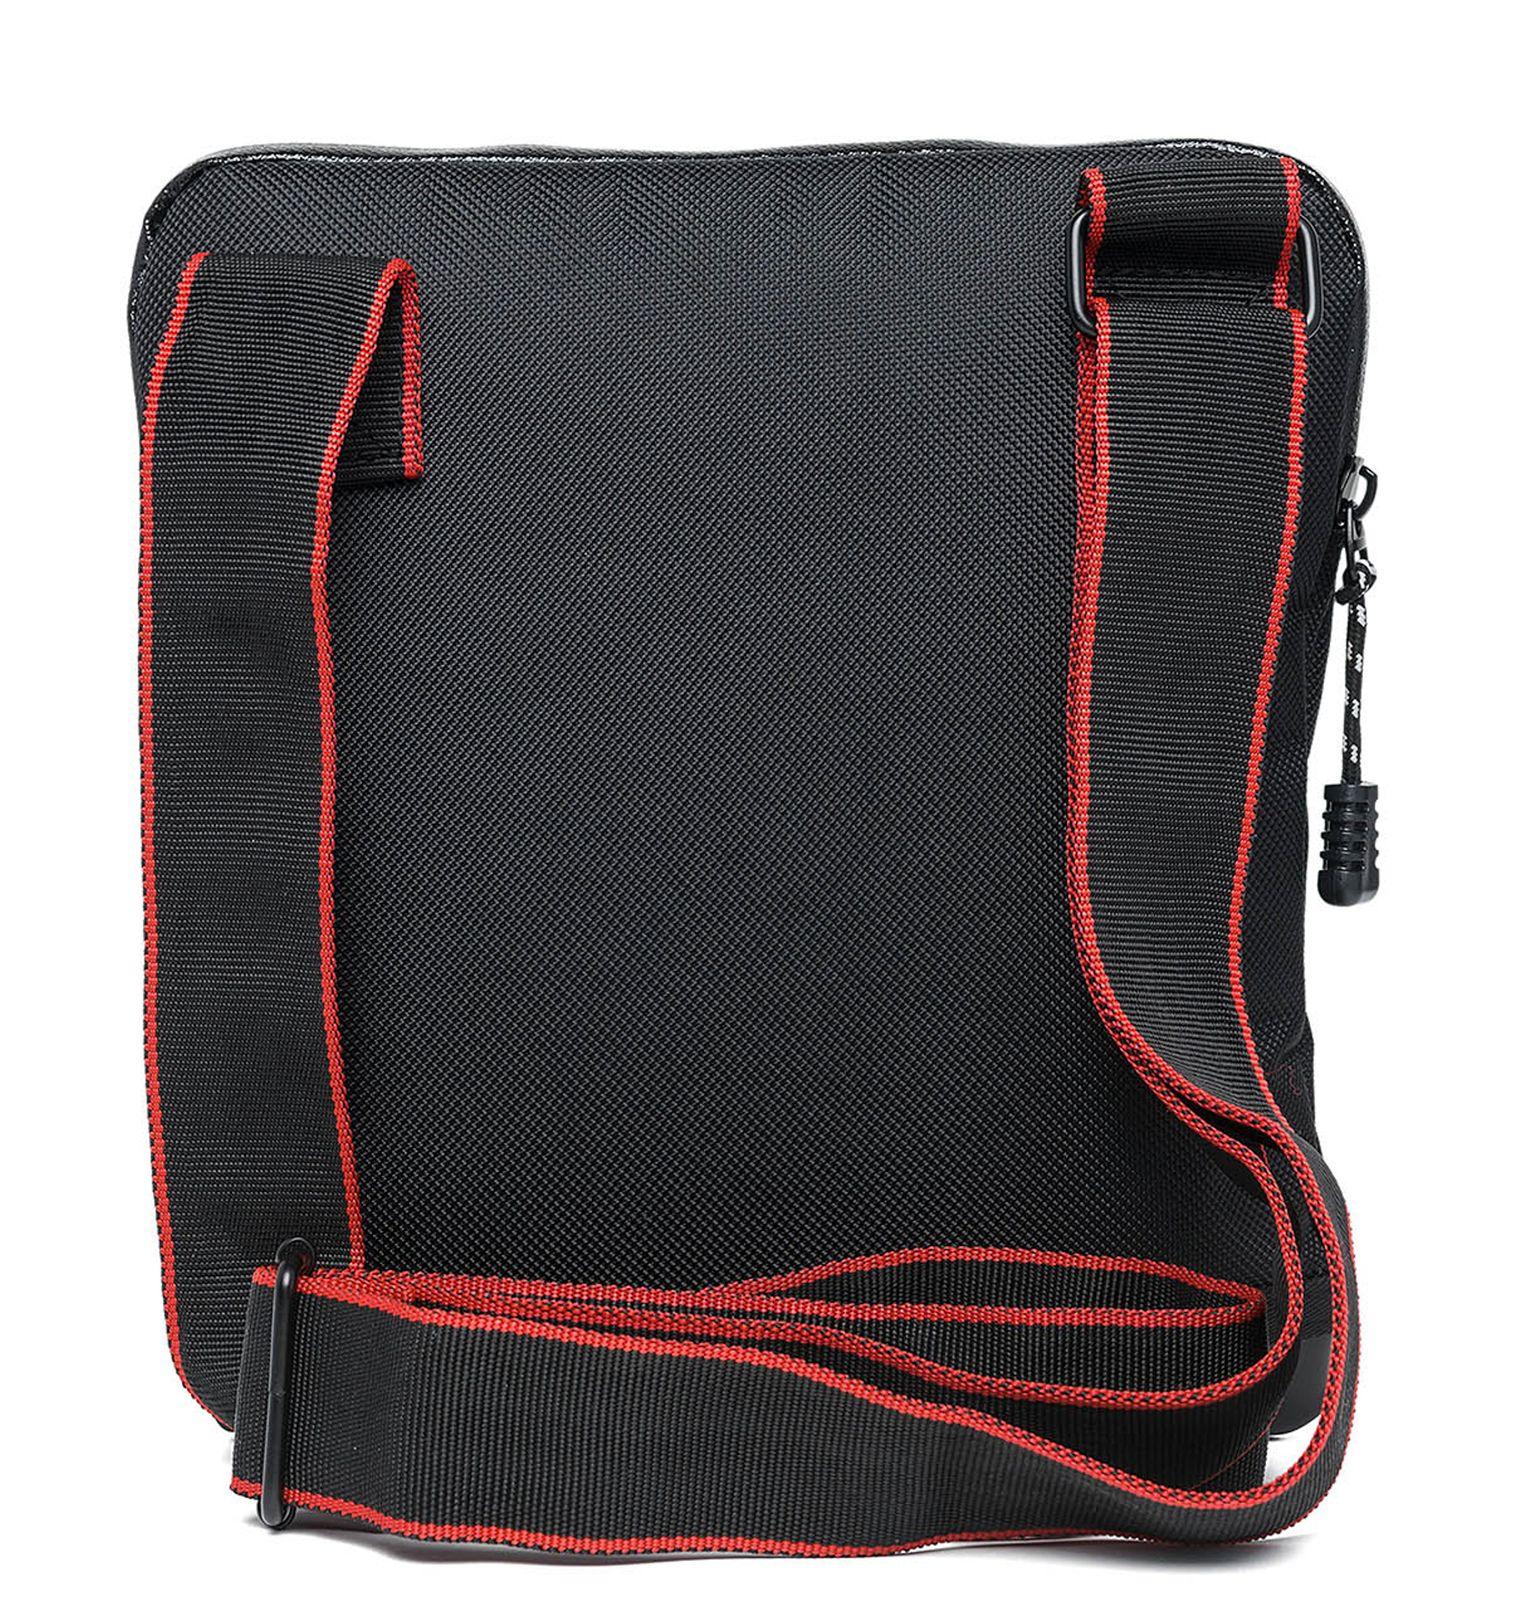 ... To CloseREPLAY Nylon Crossbody Bag Black   49 0d43fd44ac395